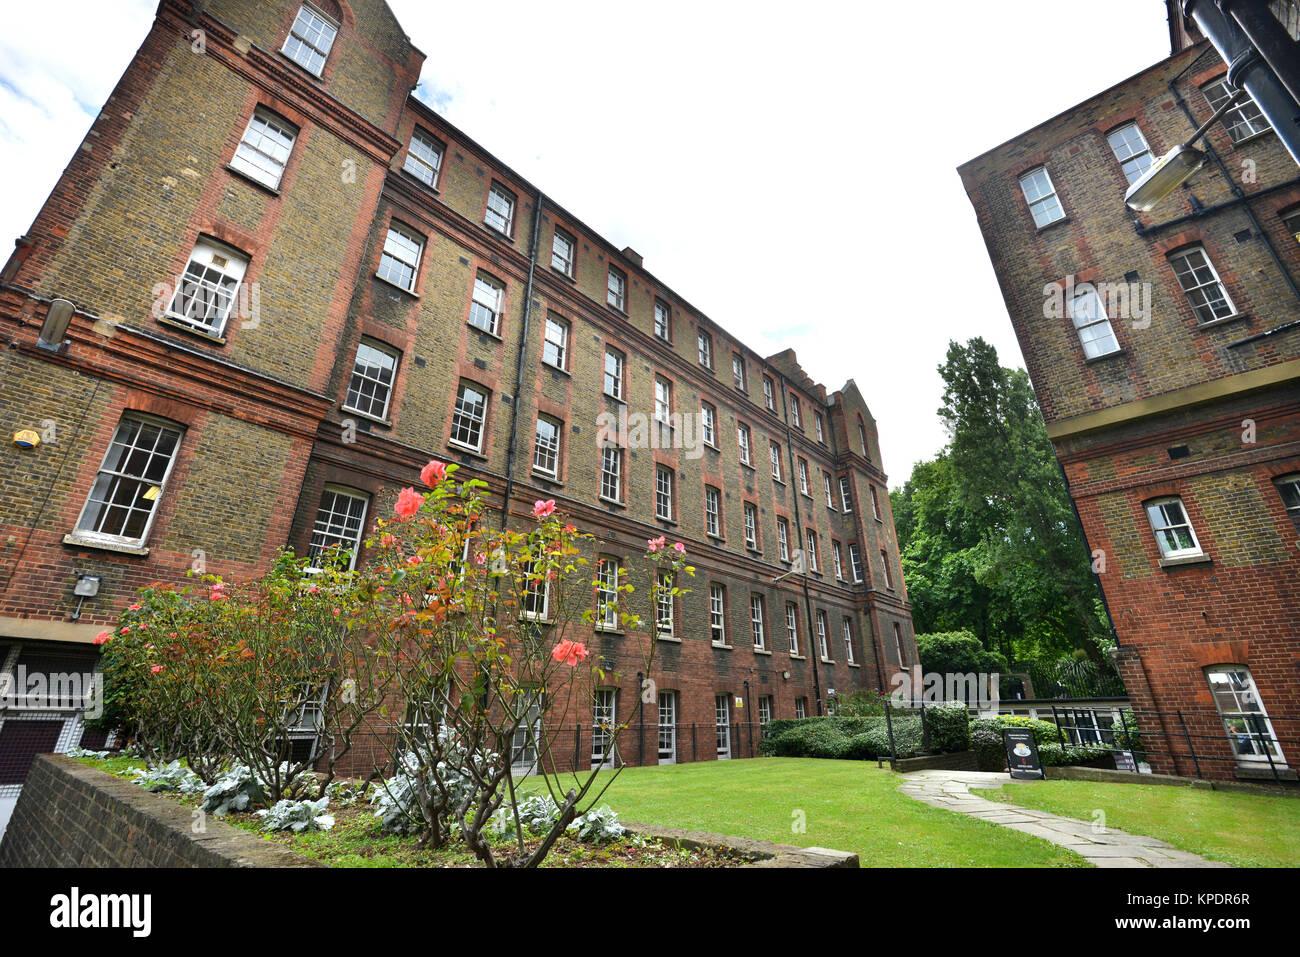 St Pancras Hospital, London - Stock Image